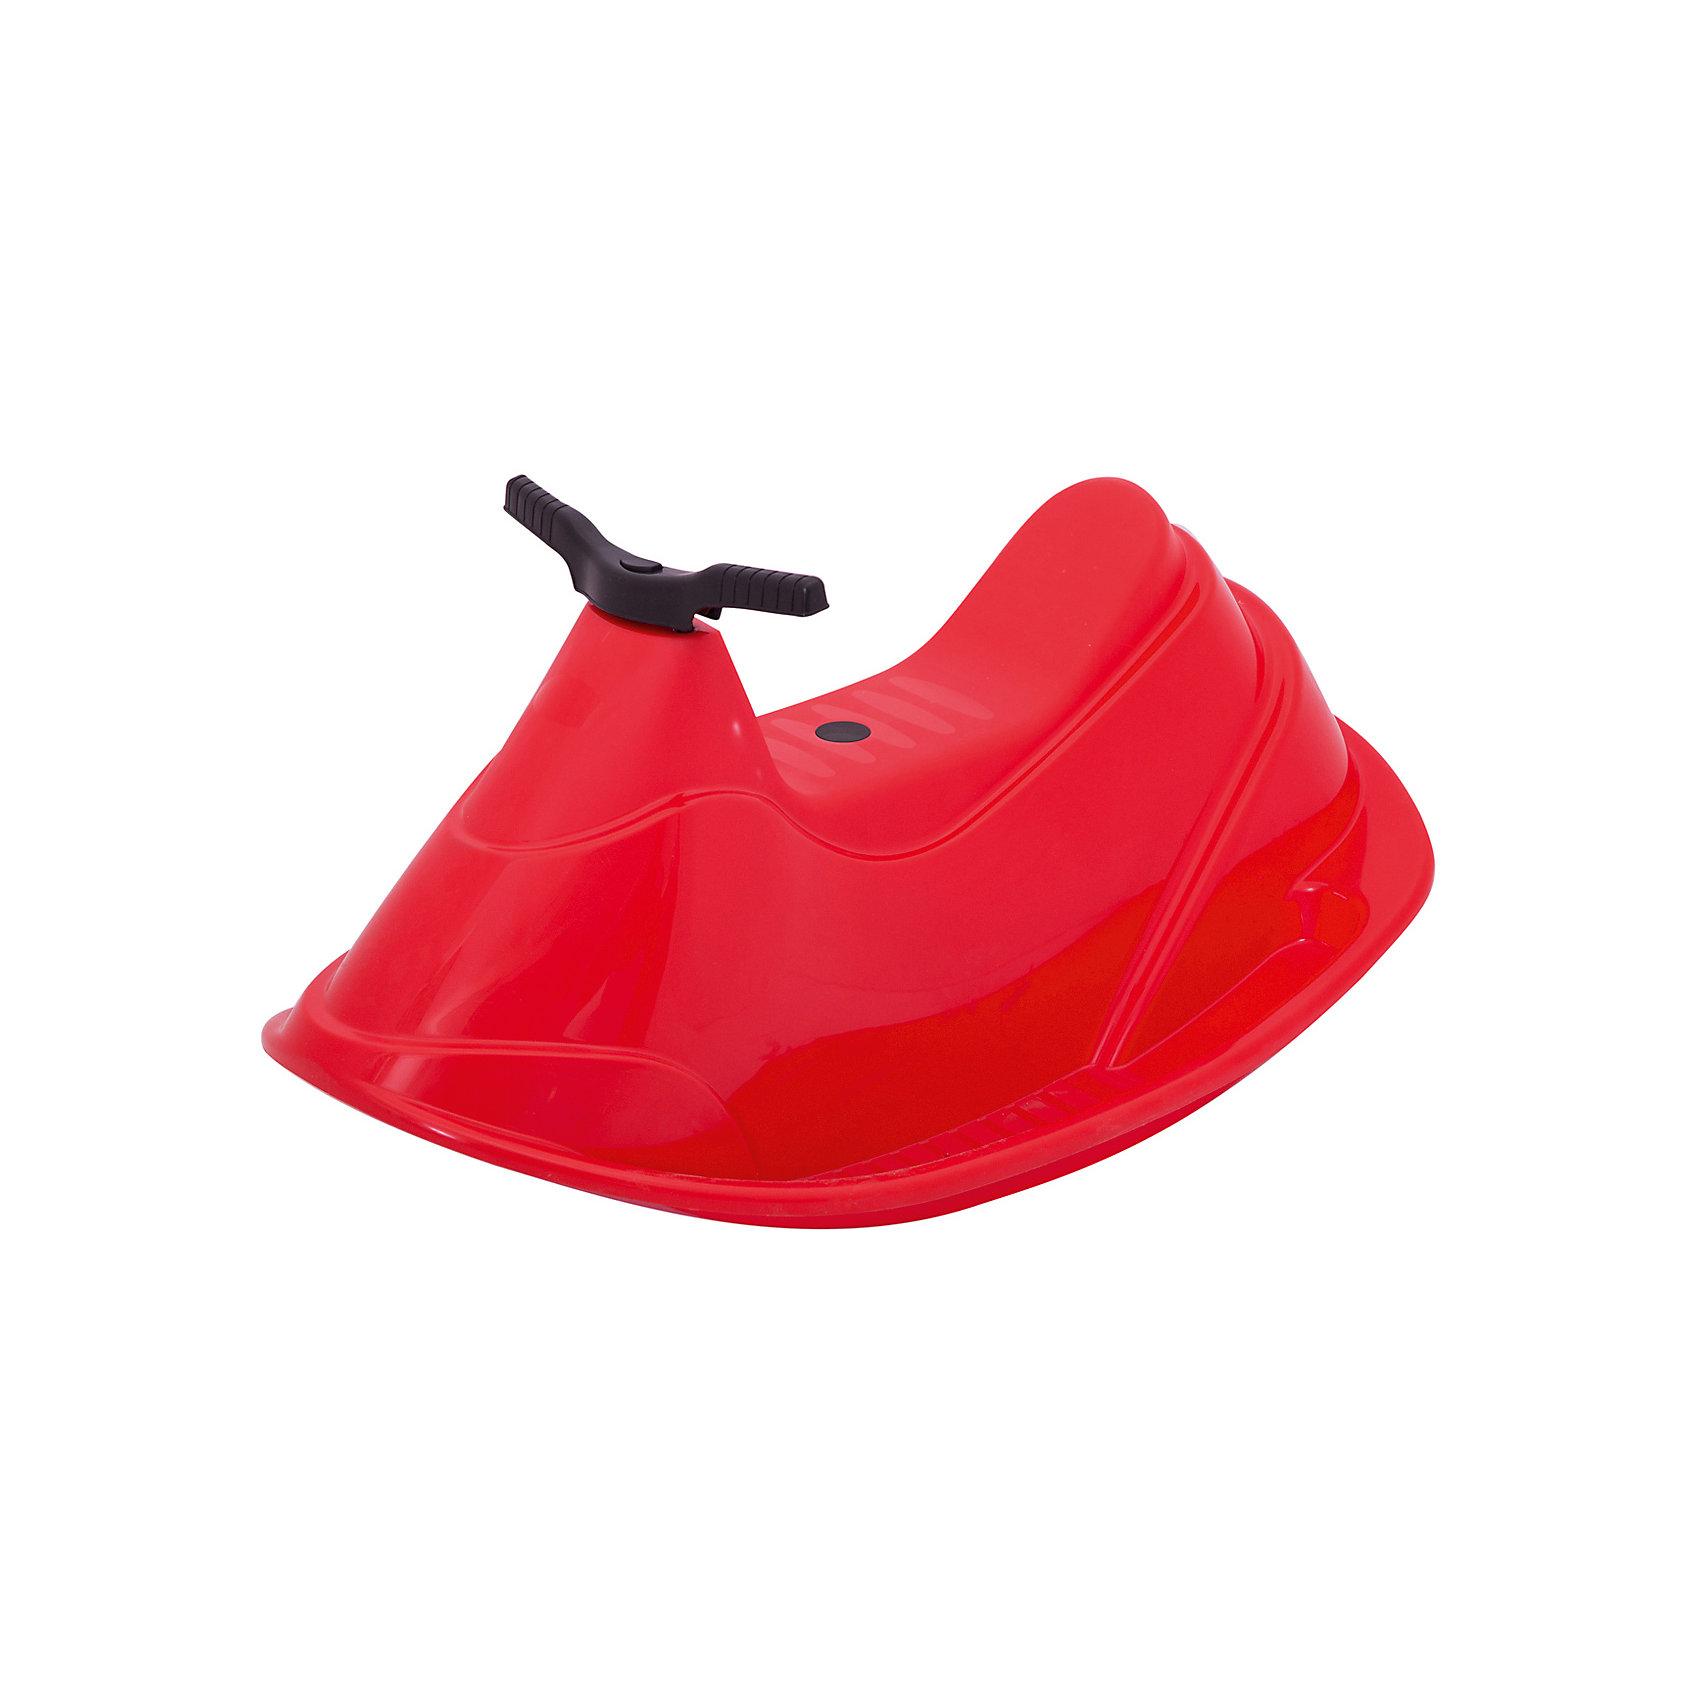 Качели - Водный Мотоцикл, Marianplast